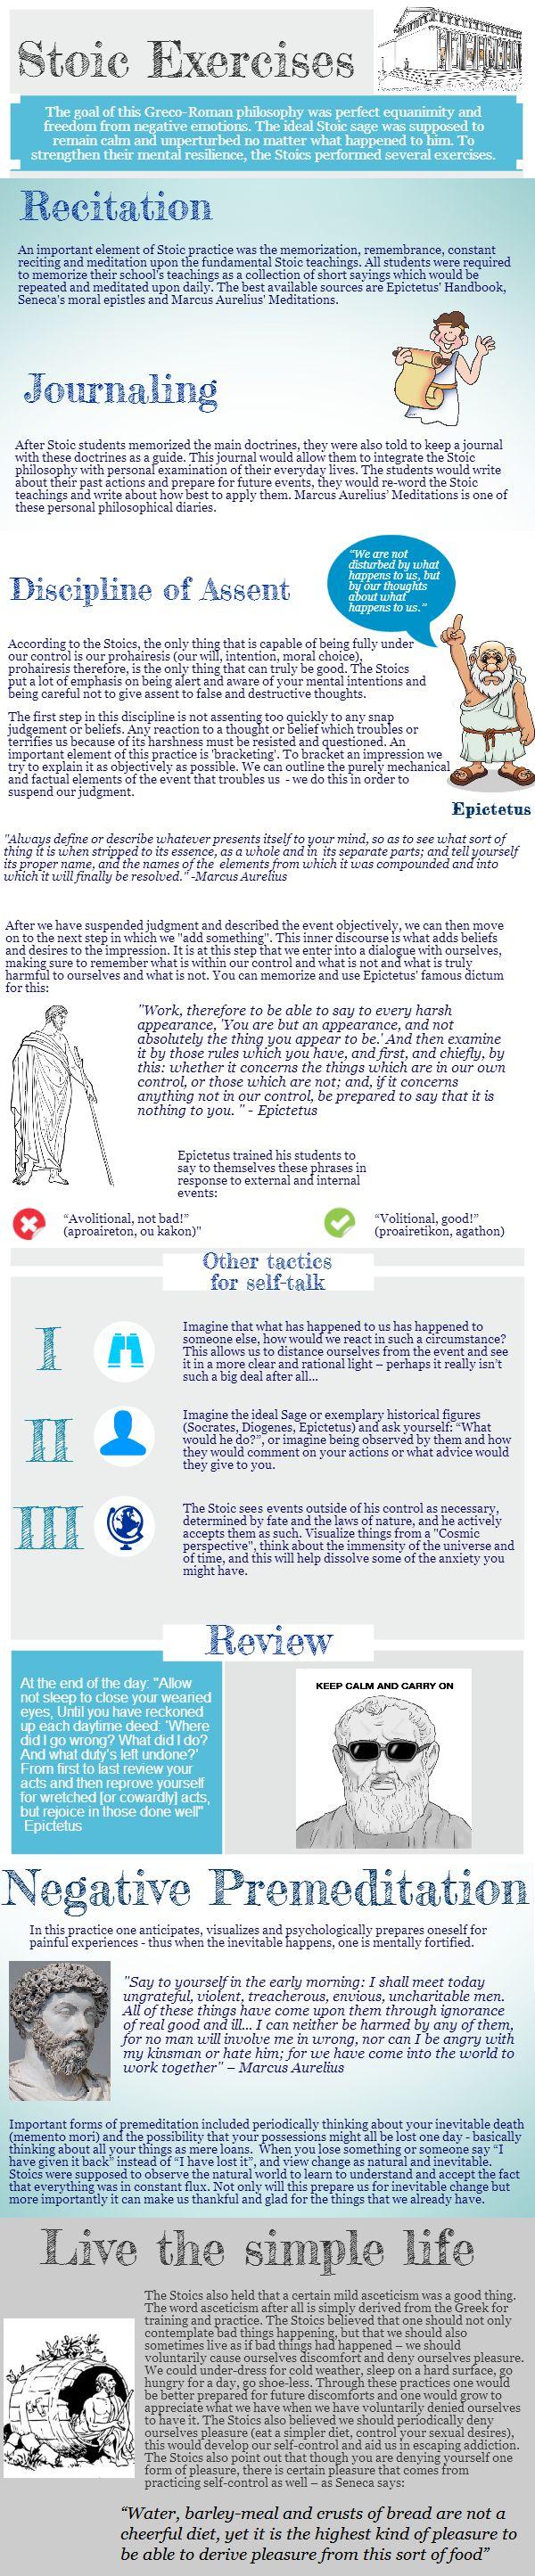 Stoic exercises info-graphic - Imgur